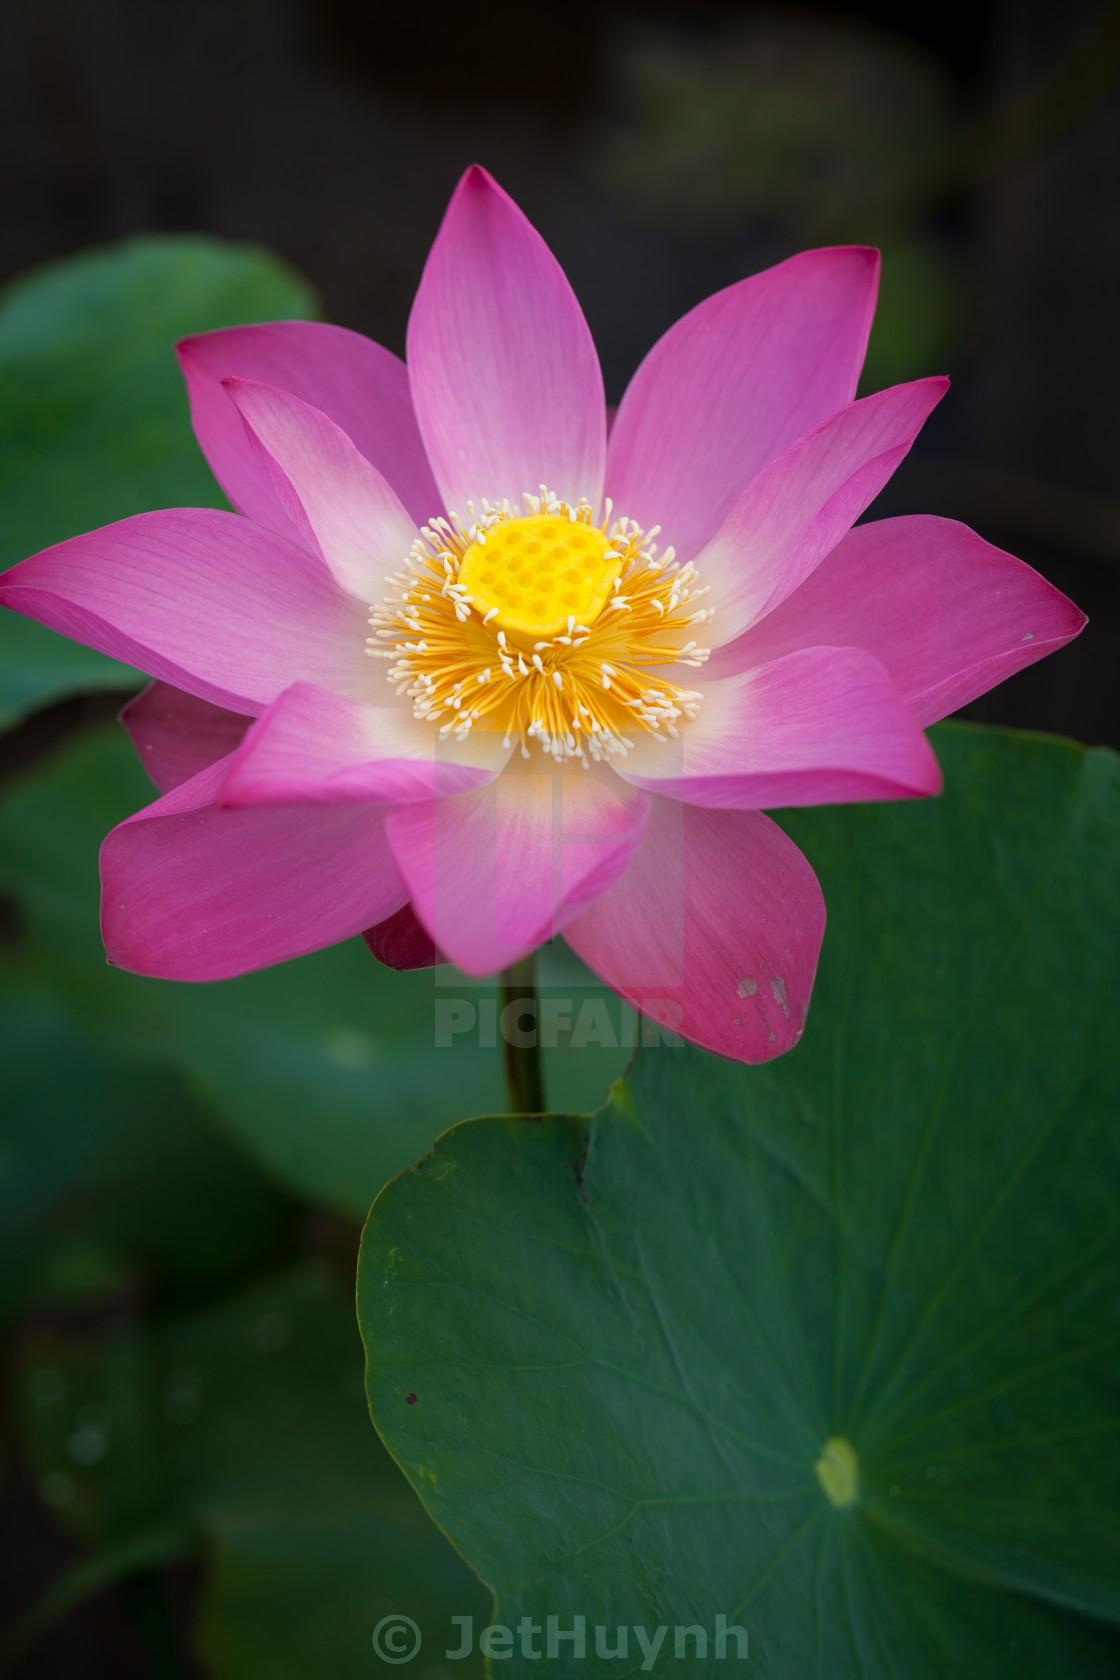 Beautiful lotus flower hoa sen blooming in pond license for beautiful lotus flower hoa sen blooming in pond stock image izmirmasajfo